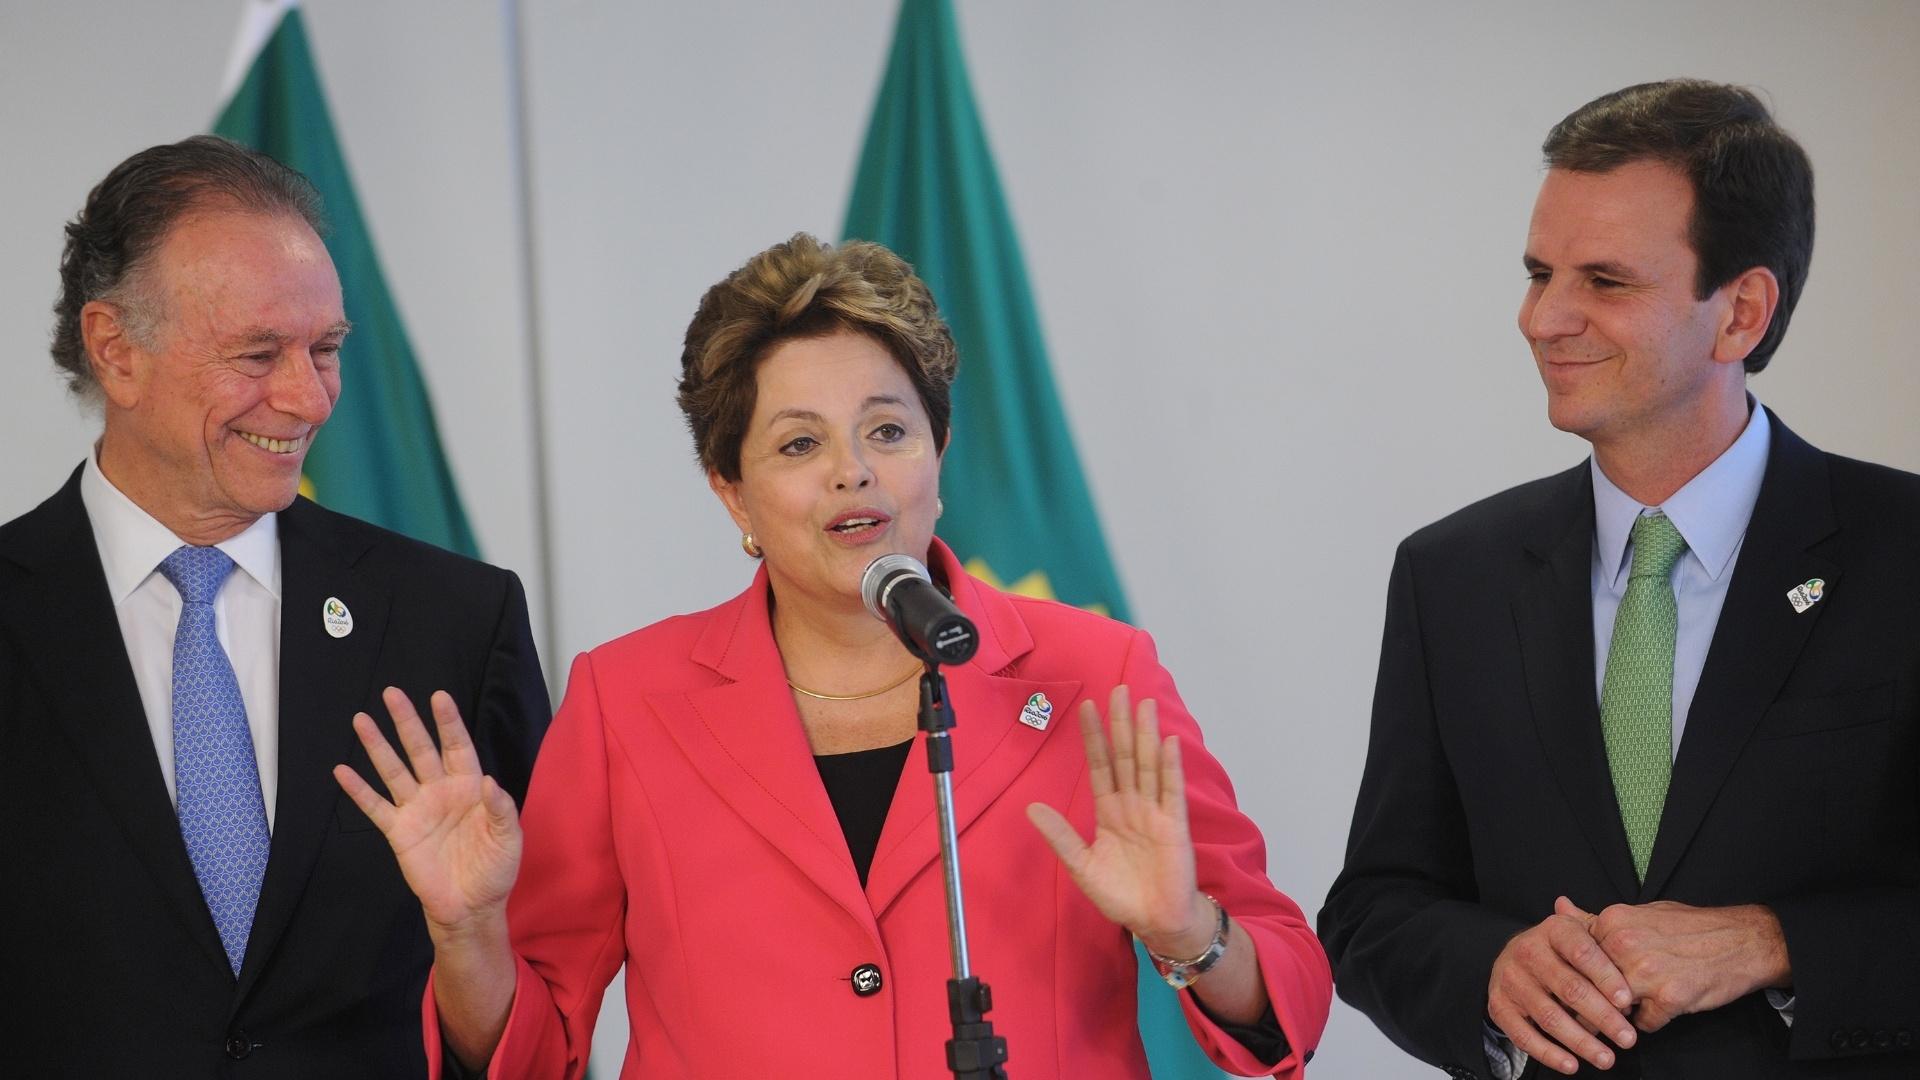 Presidente Dilma discursa após receber bandeira olímpica de Carlos Arthur Nuzman, presidente do COB, e Eduardo Paes, prefeito do Rio de Janeiro